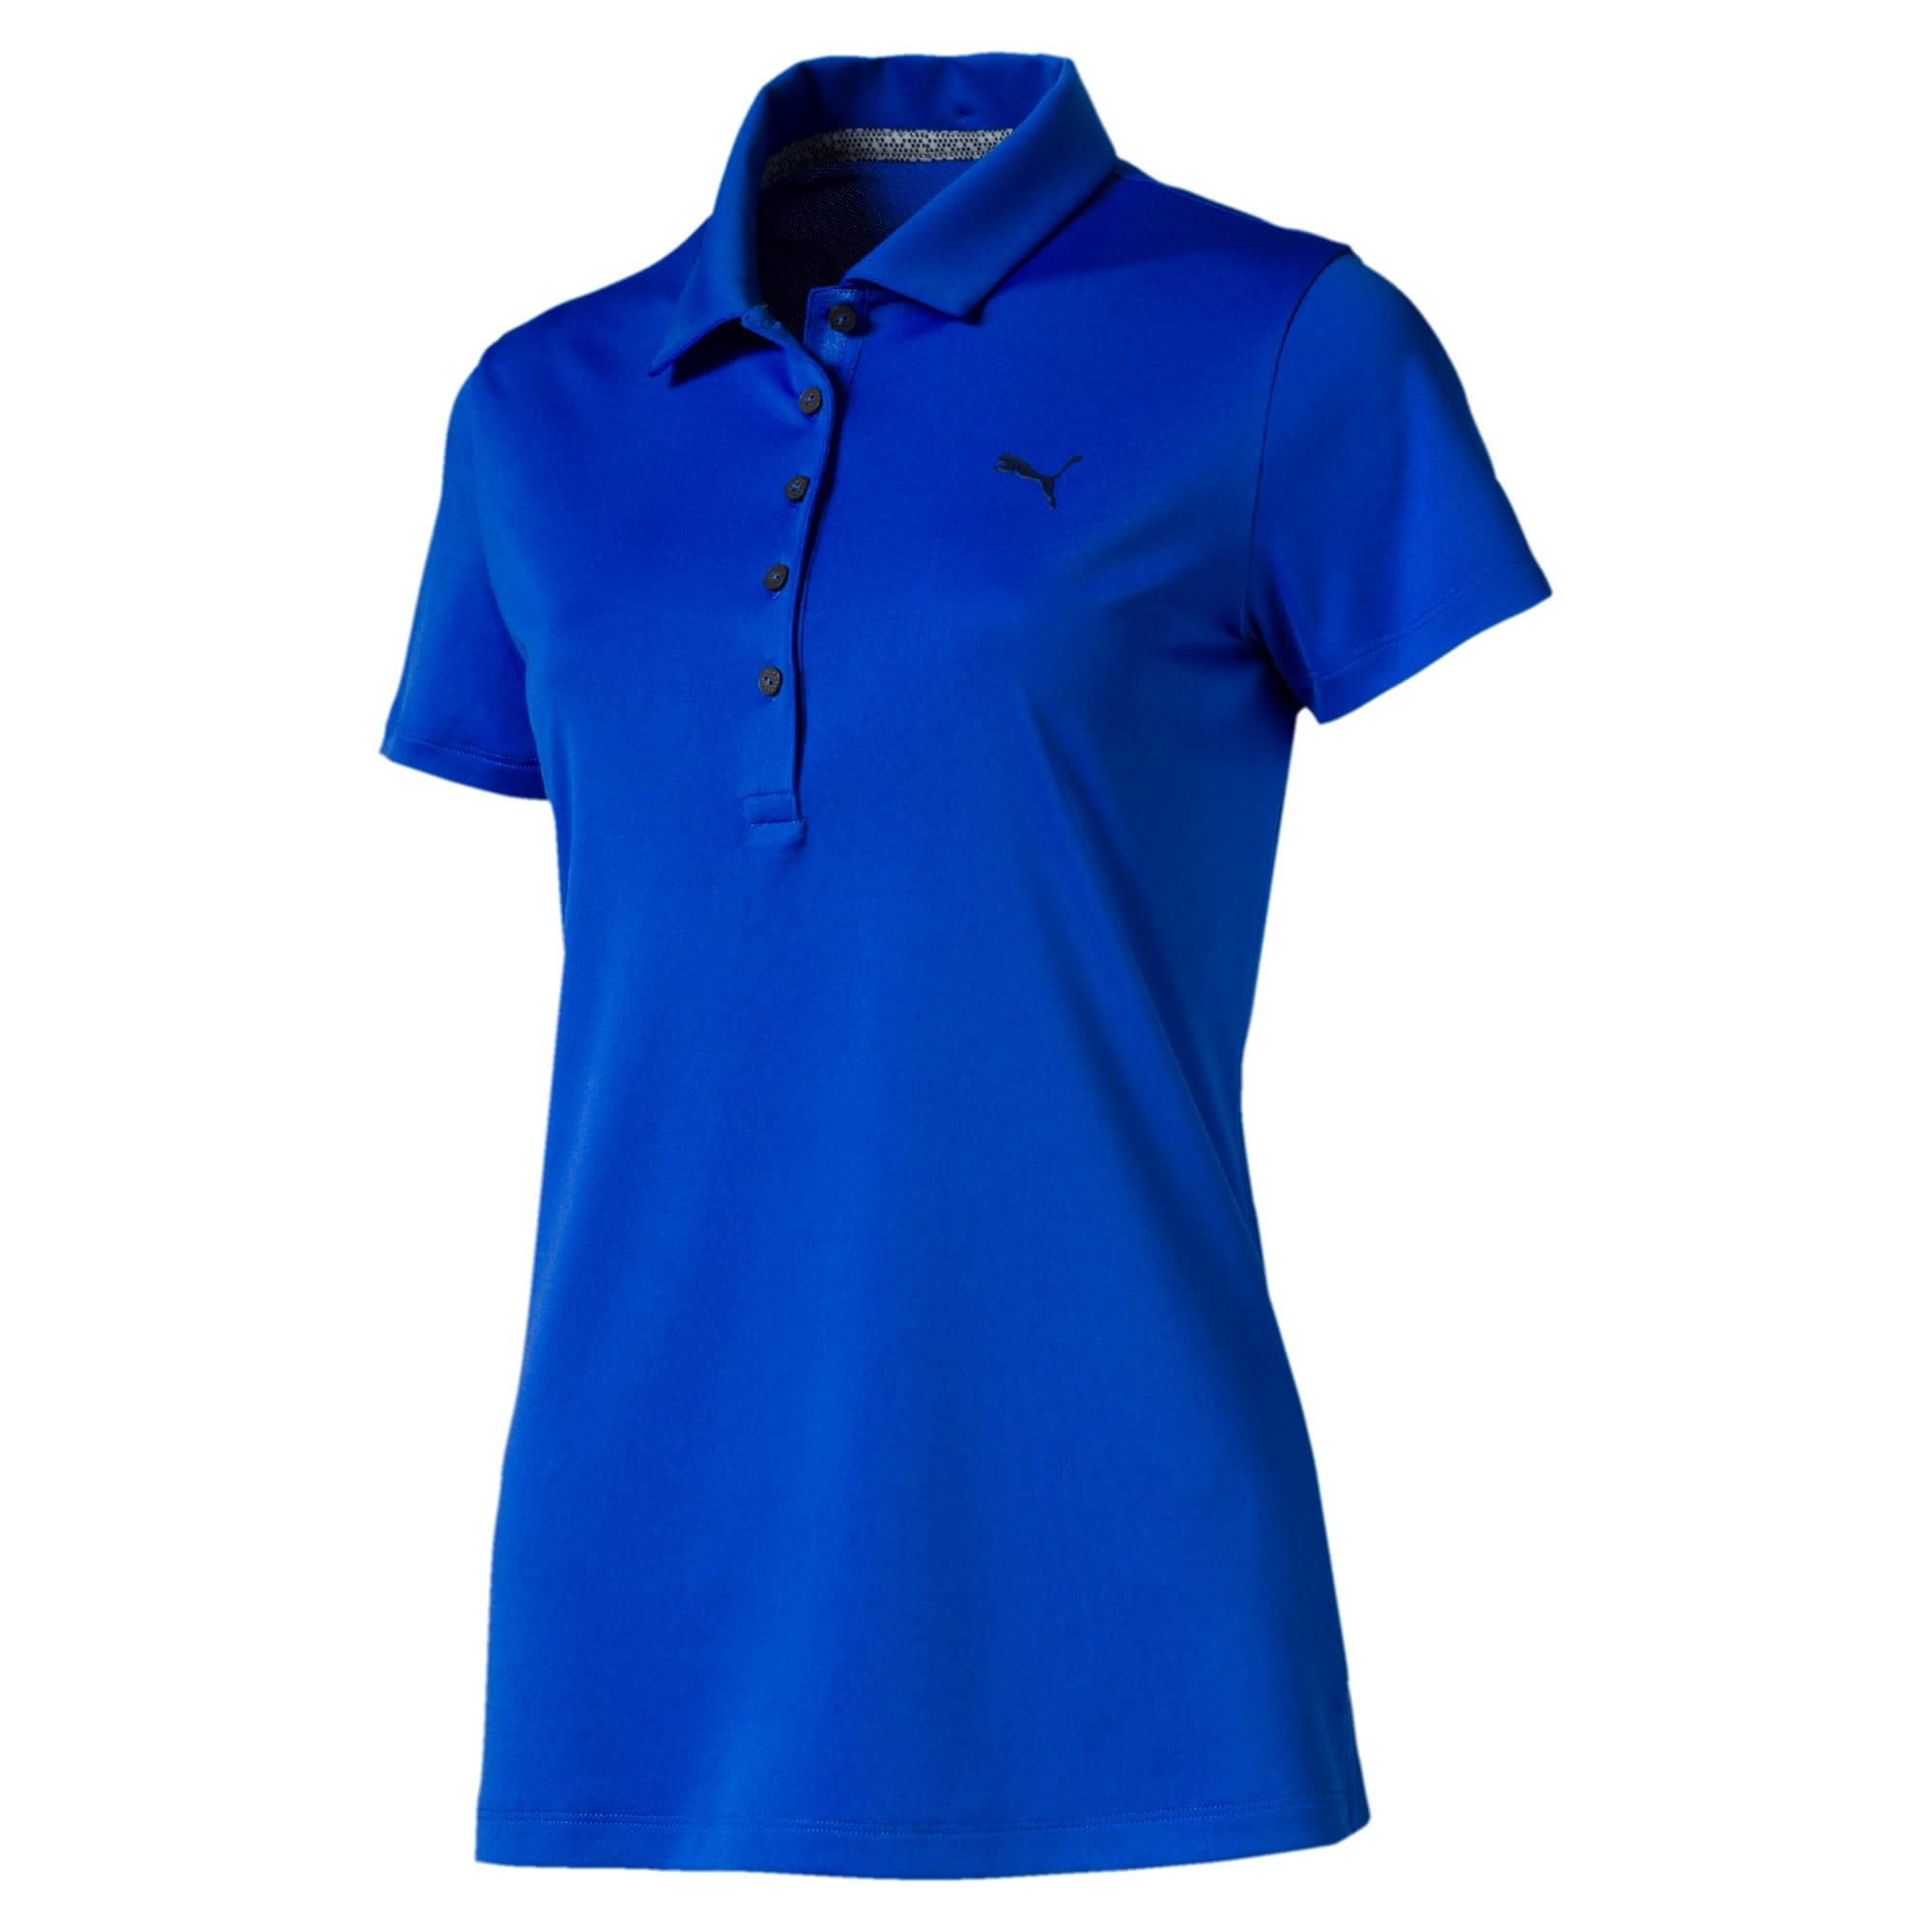 Thumbnail 4 of Golfpoloshirts voor dames, Dazzling Blue, medium